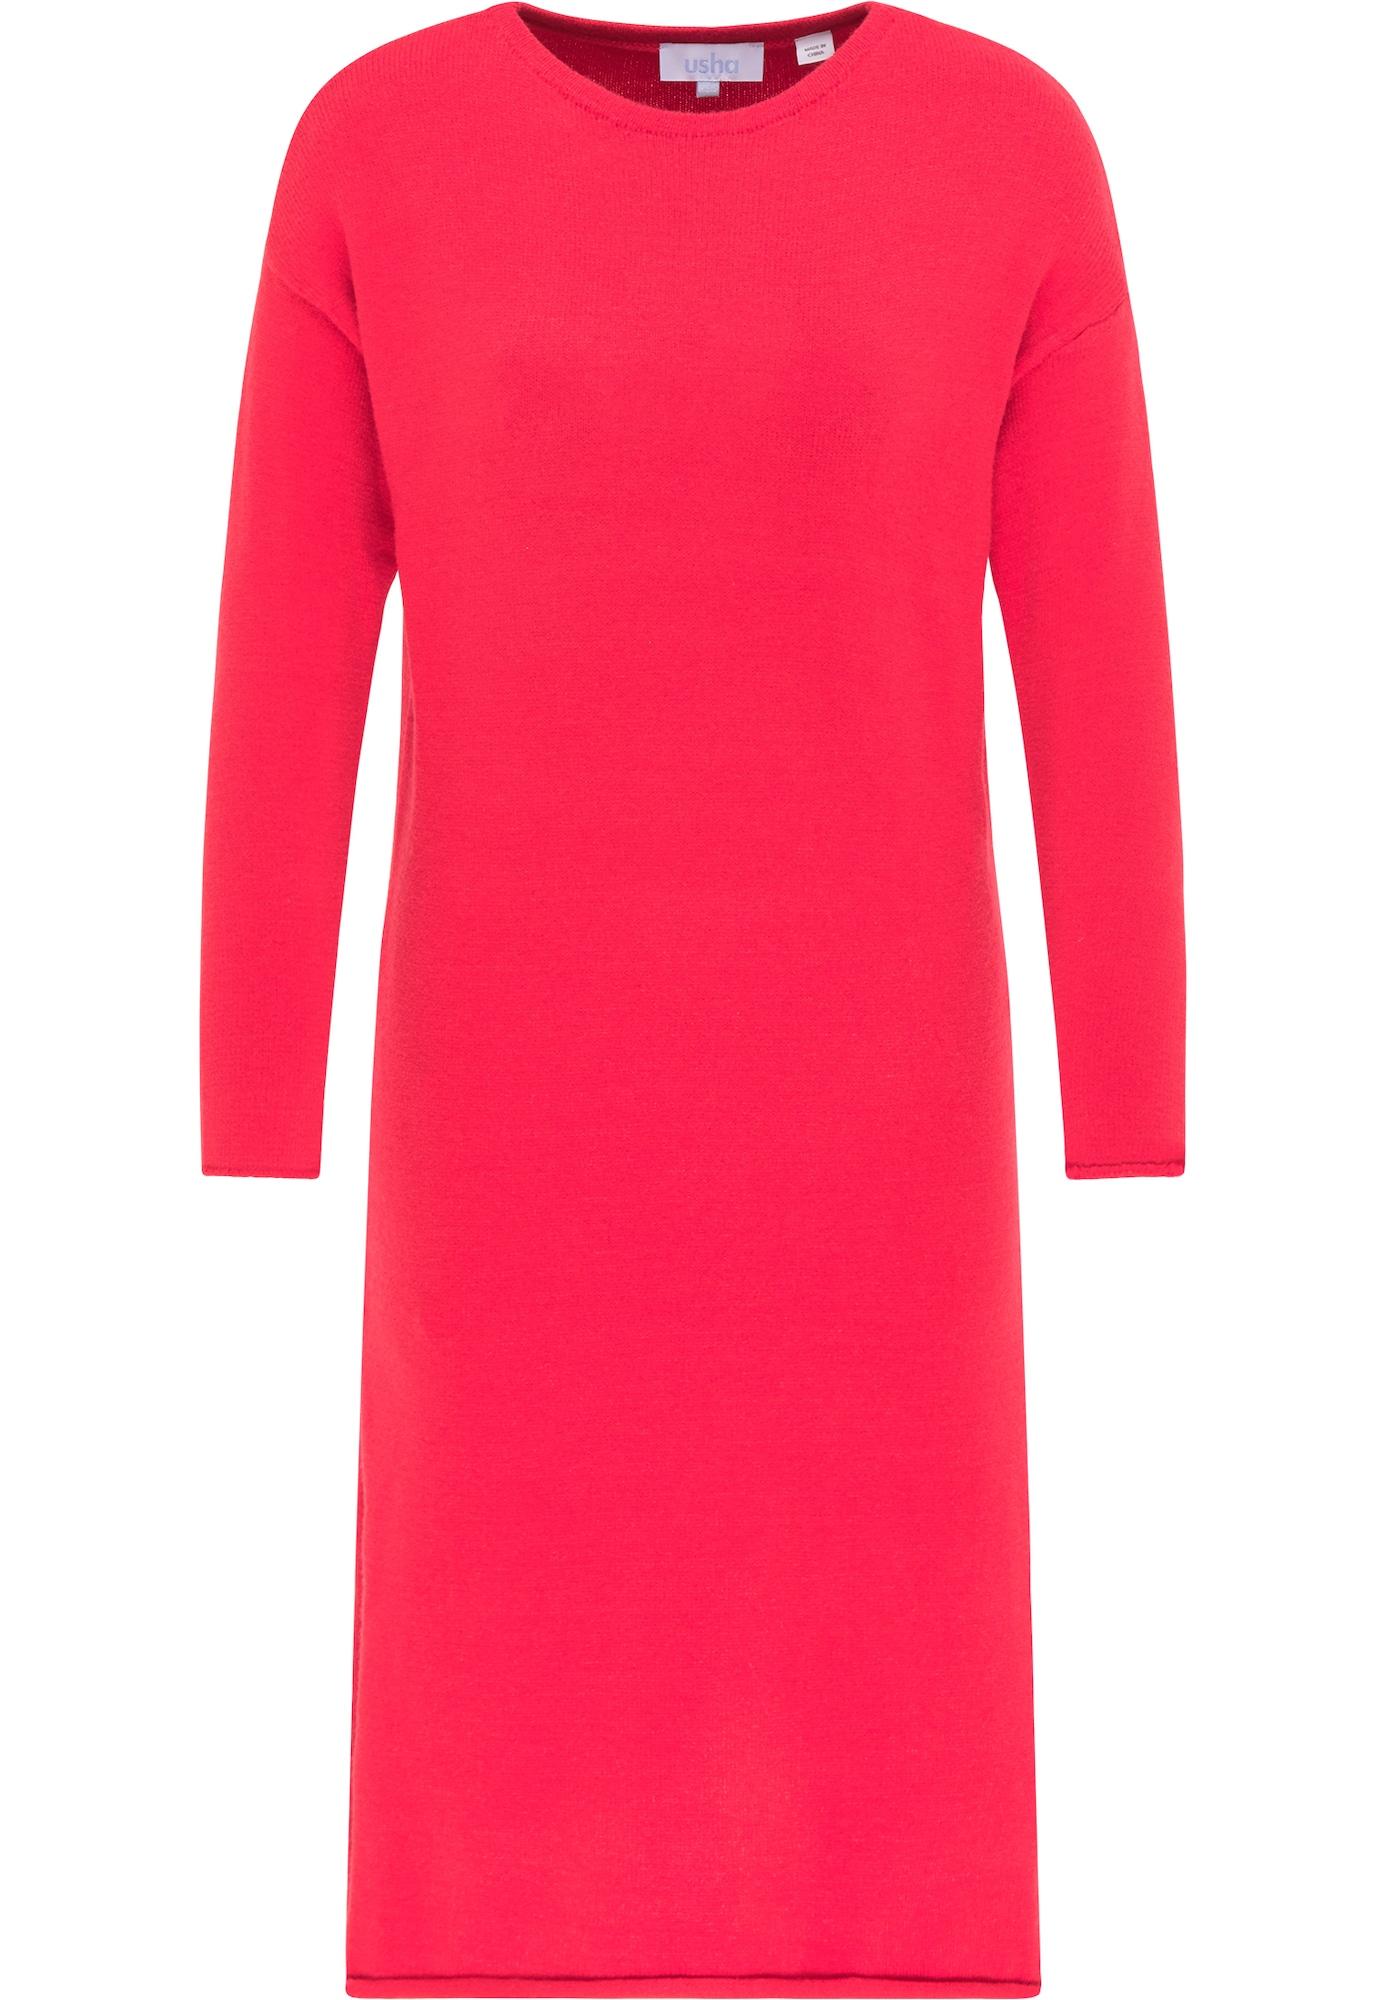 usha BLUE LABEL Megzta suknelė raudona